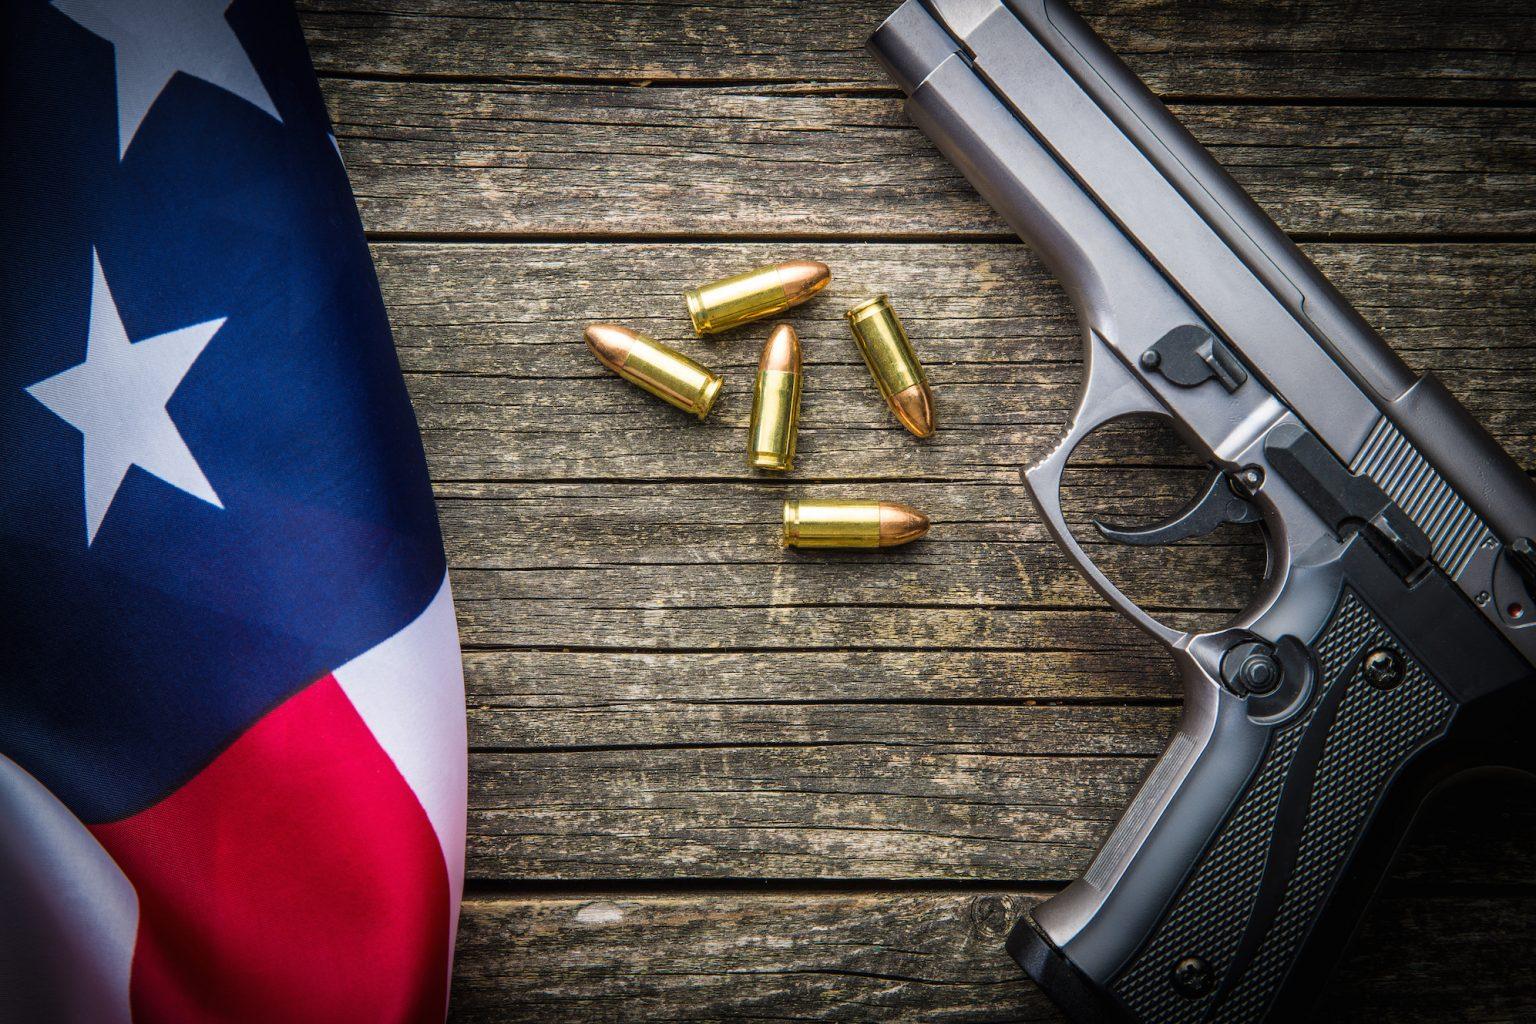 gun - best attorney - cedar rapids - Iowa - lawyer - criminal lawyer